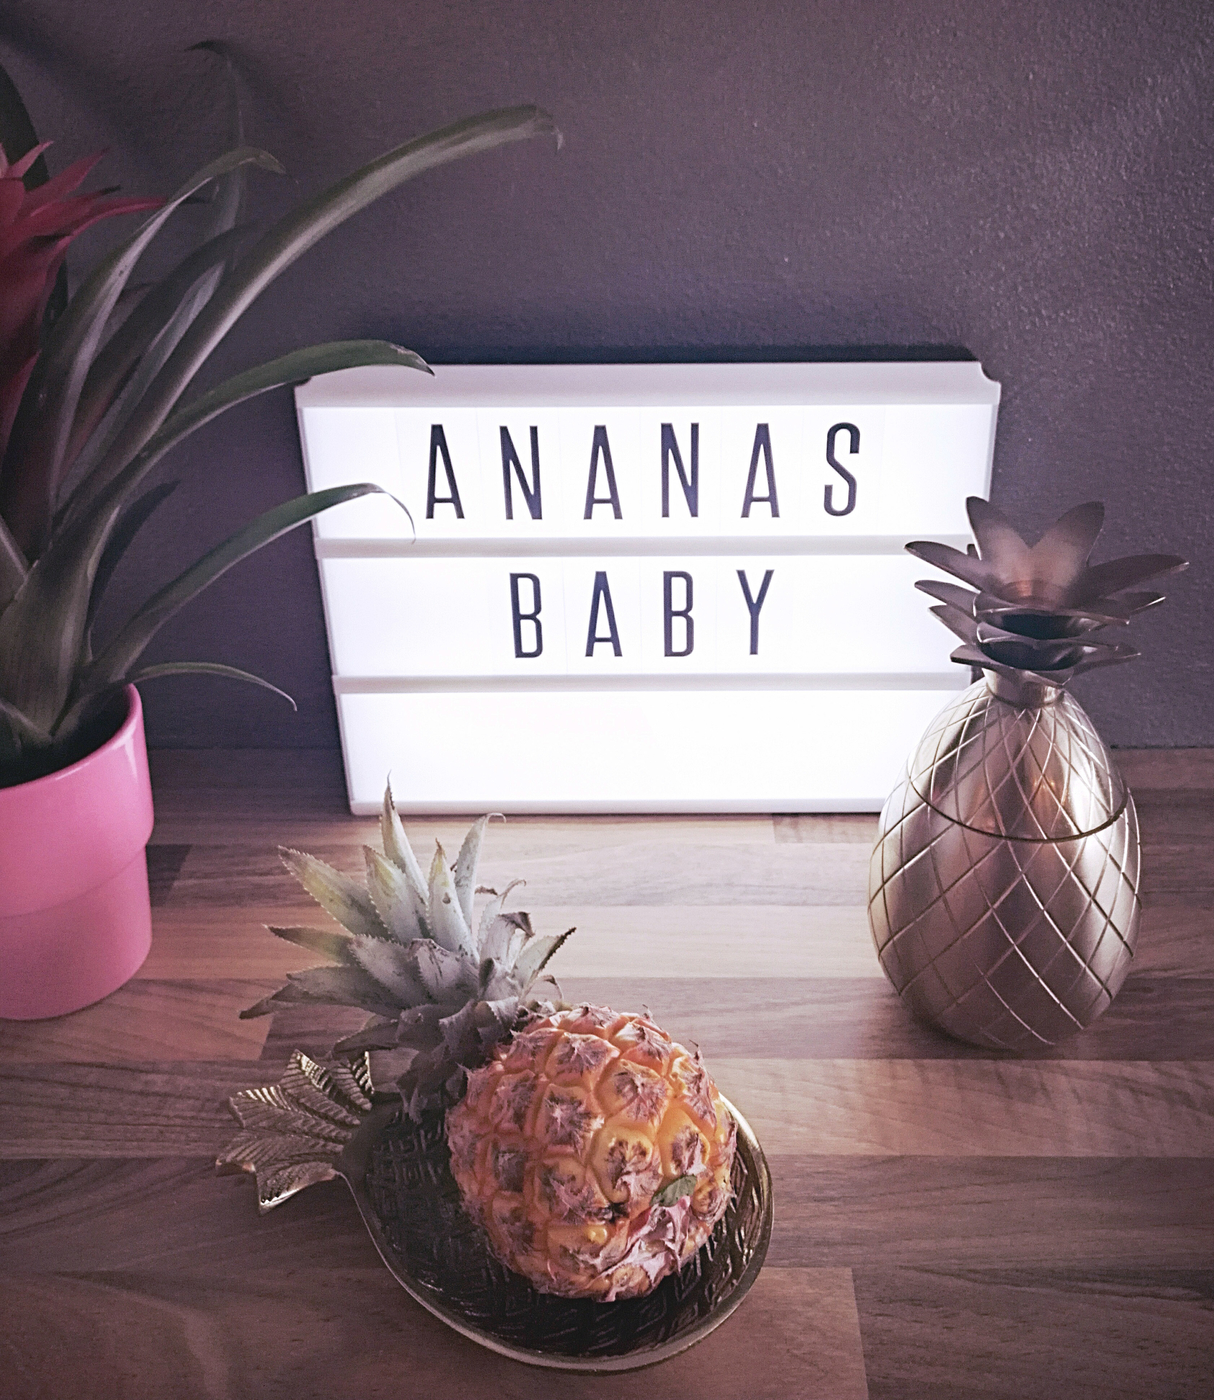 Pineapple, baby